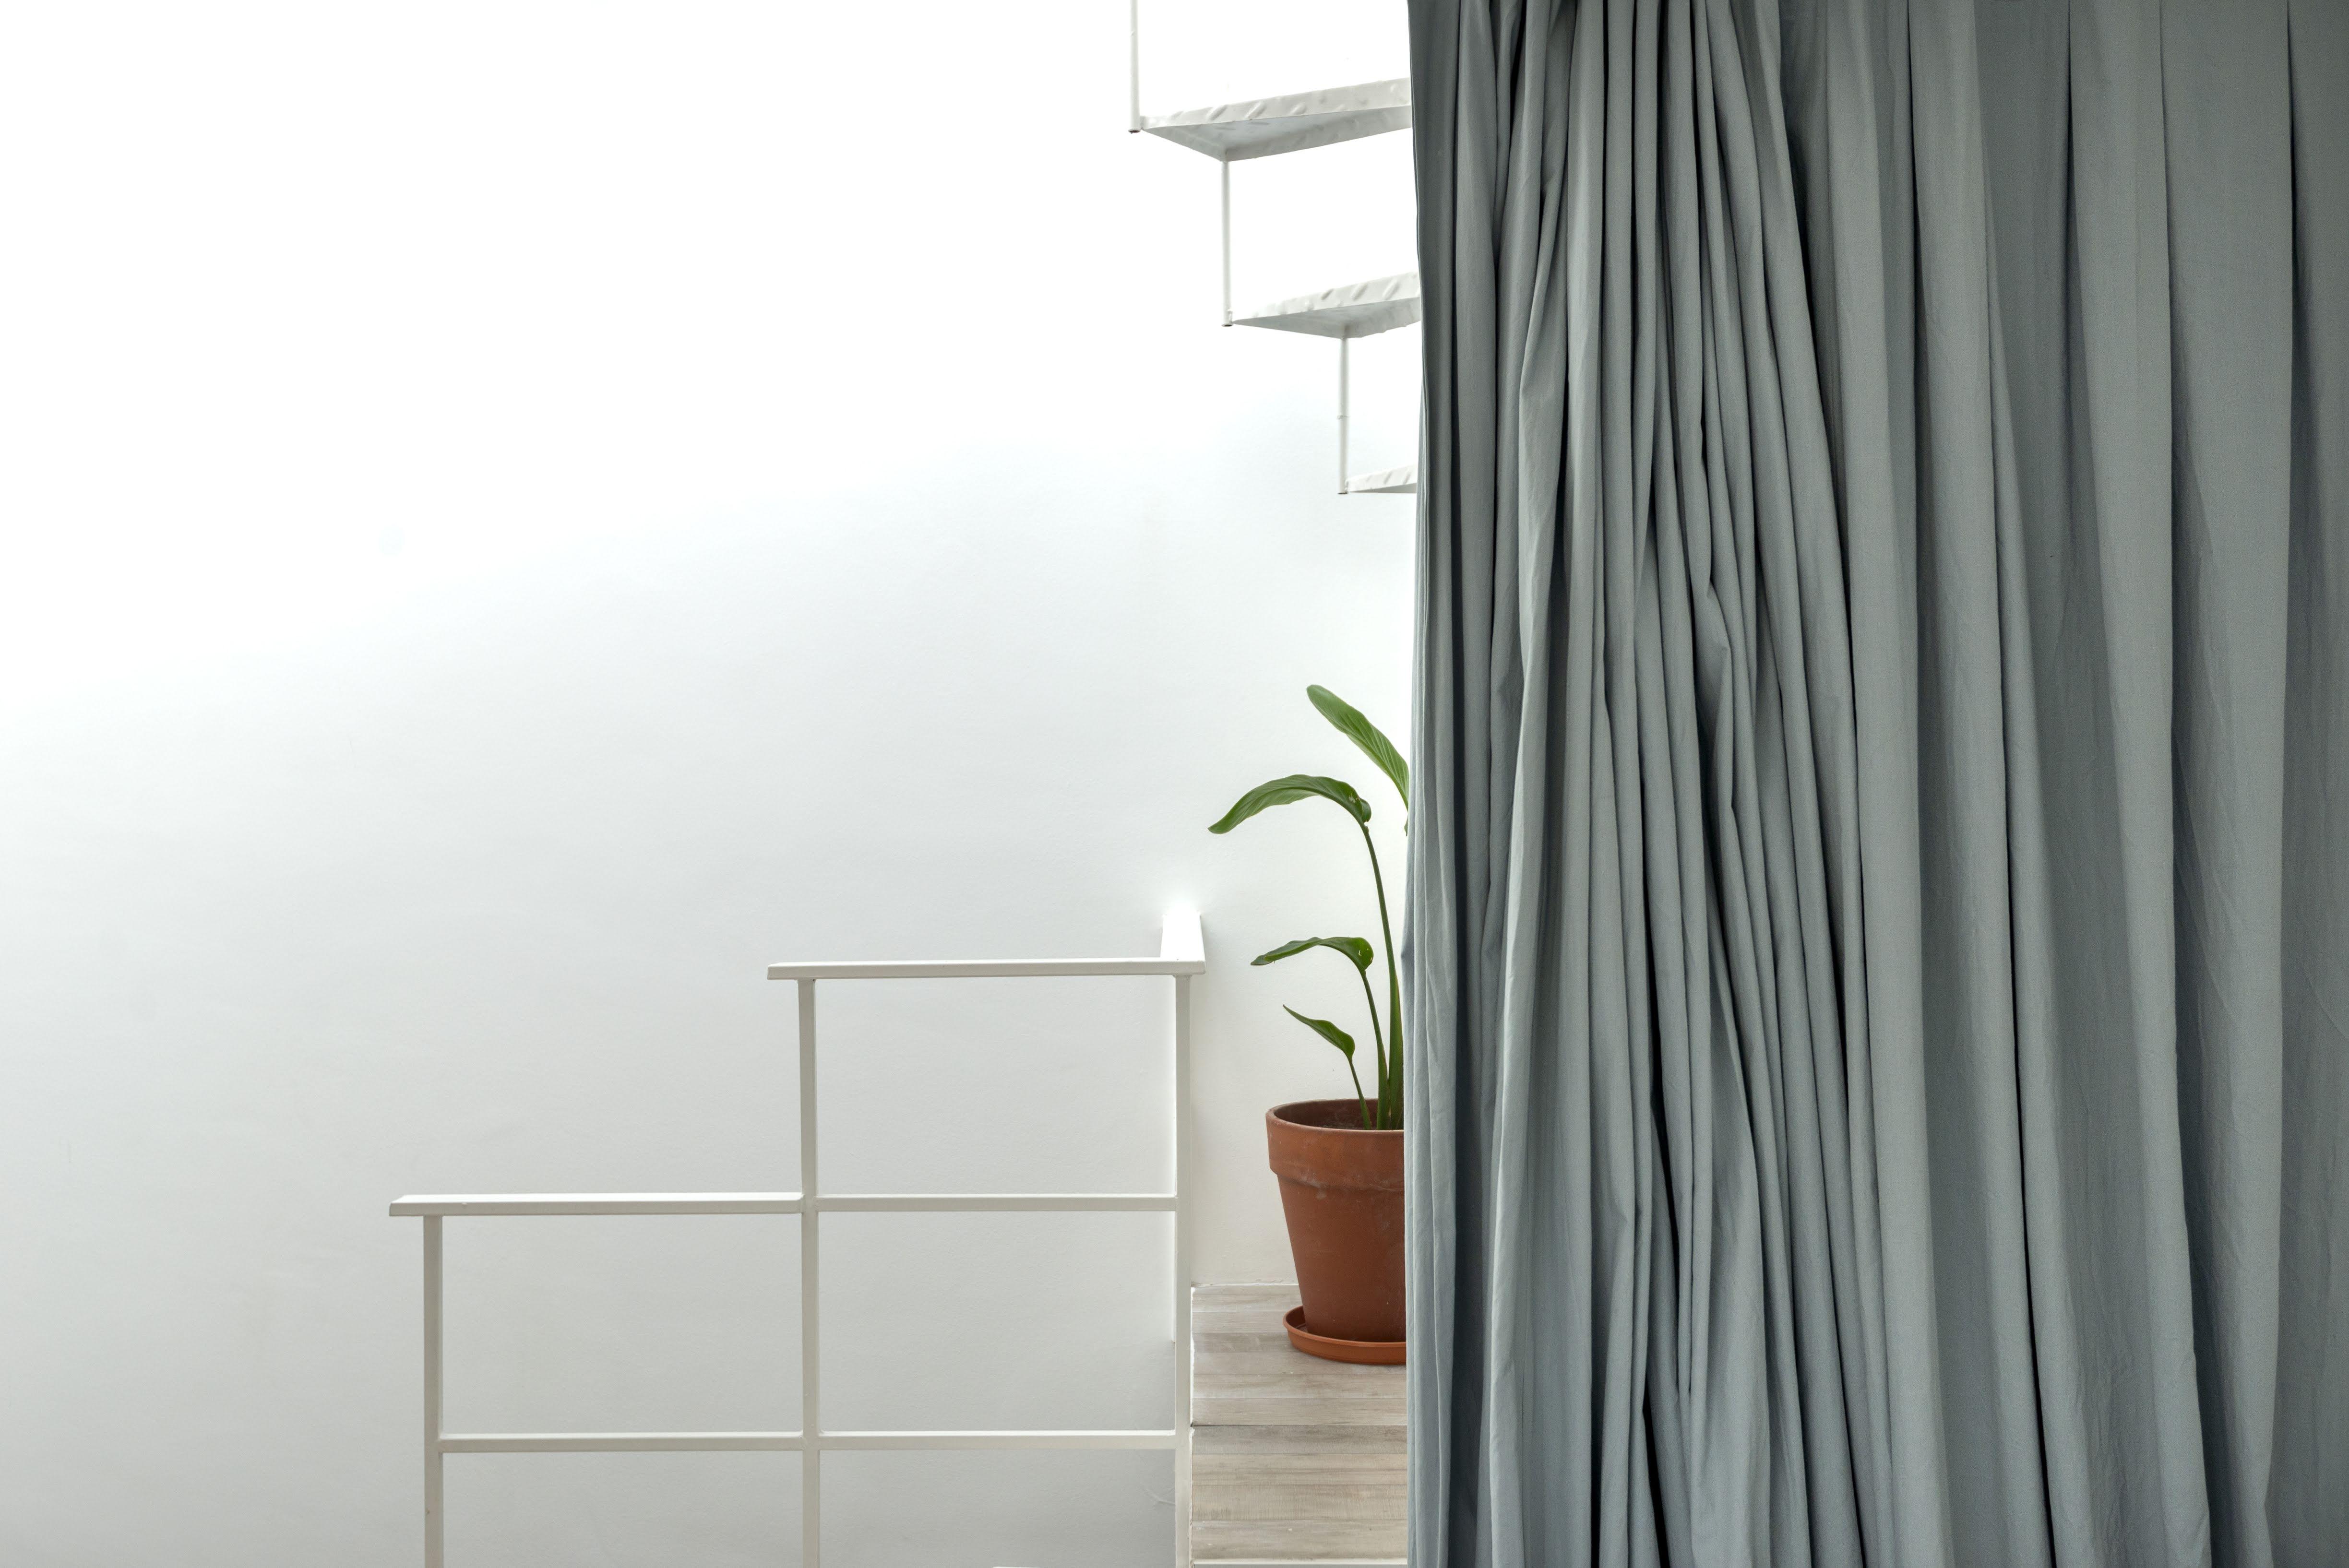 refurbishment airbnb buenos aires interior design curtain staircase